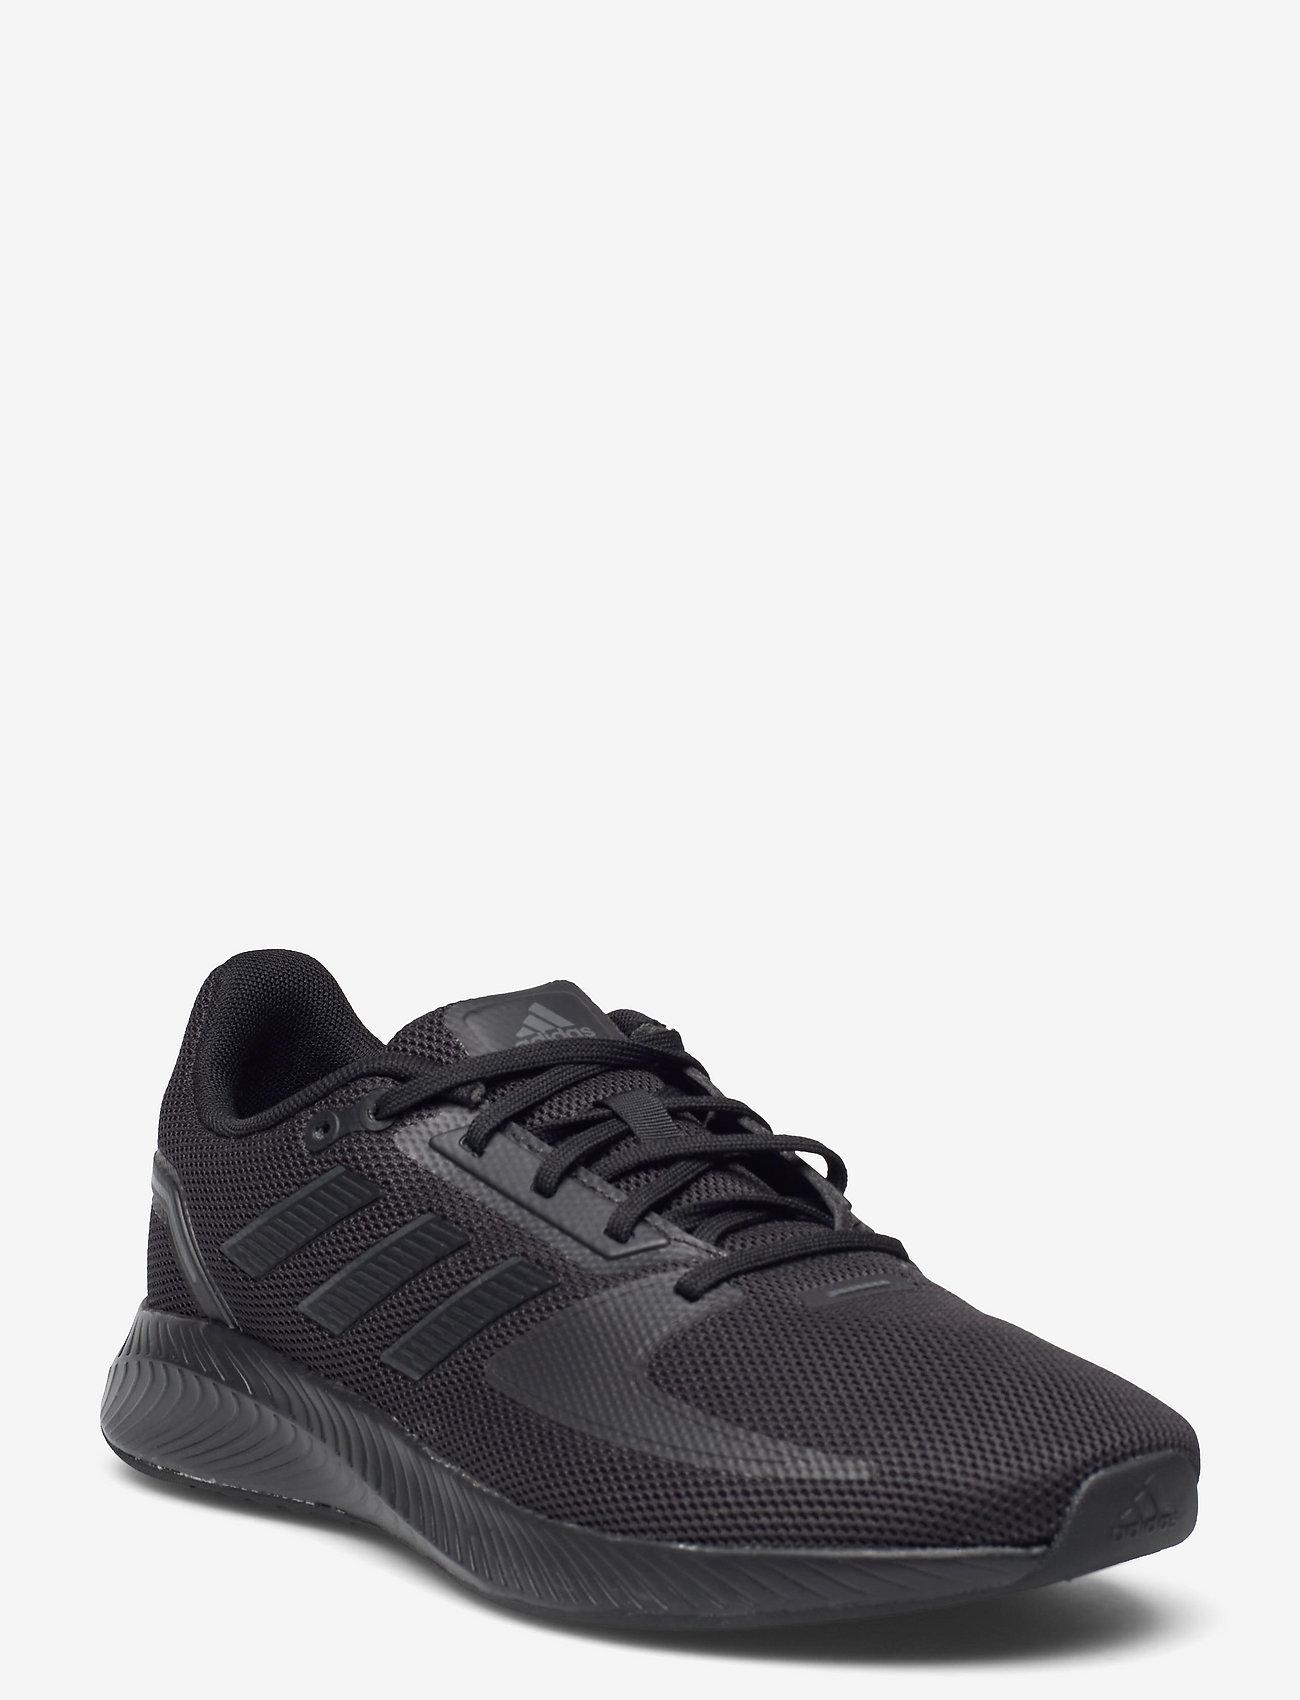 adidas Performance - Run Falcon 2.0 - löbesko - cblack/cblack/gresix - 1